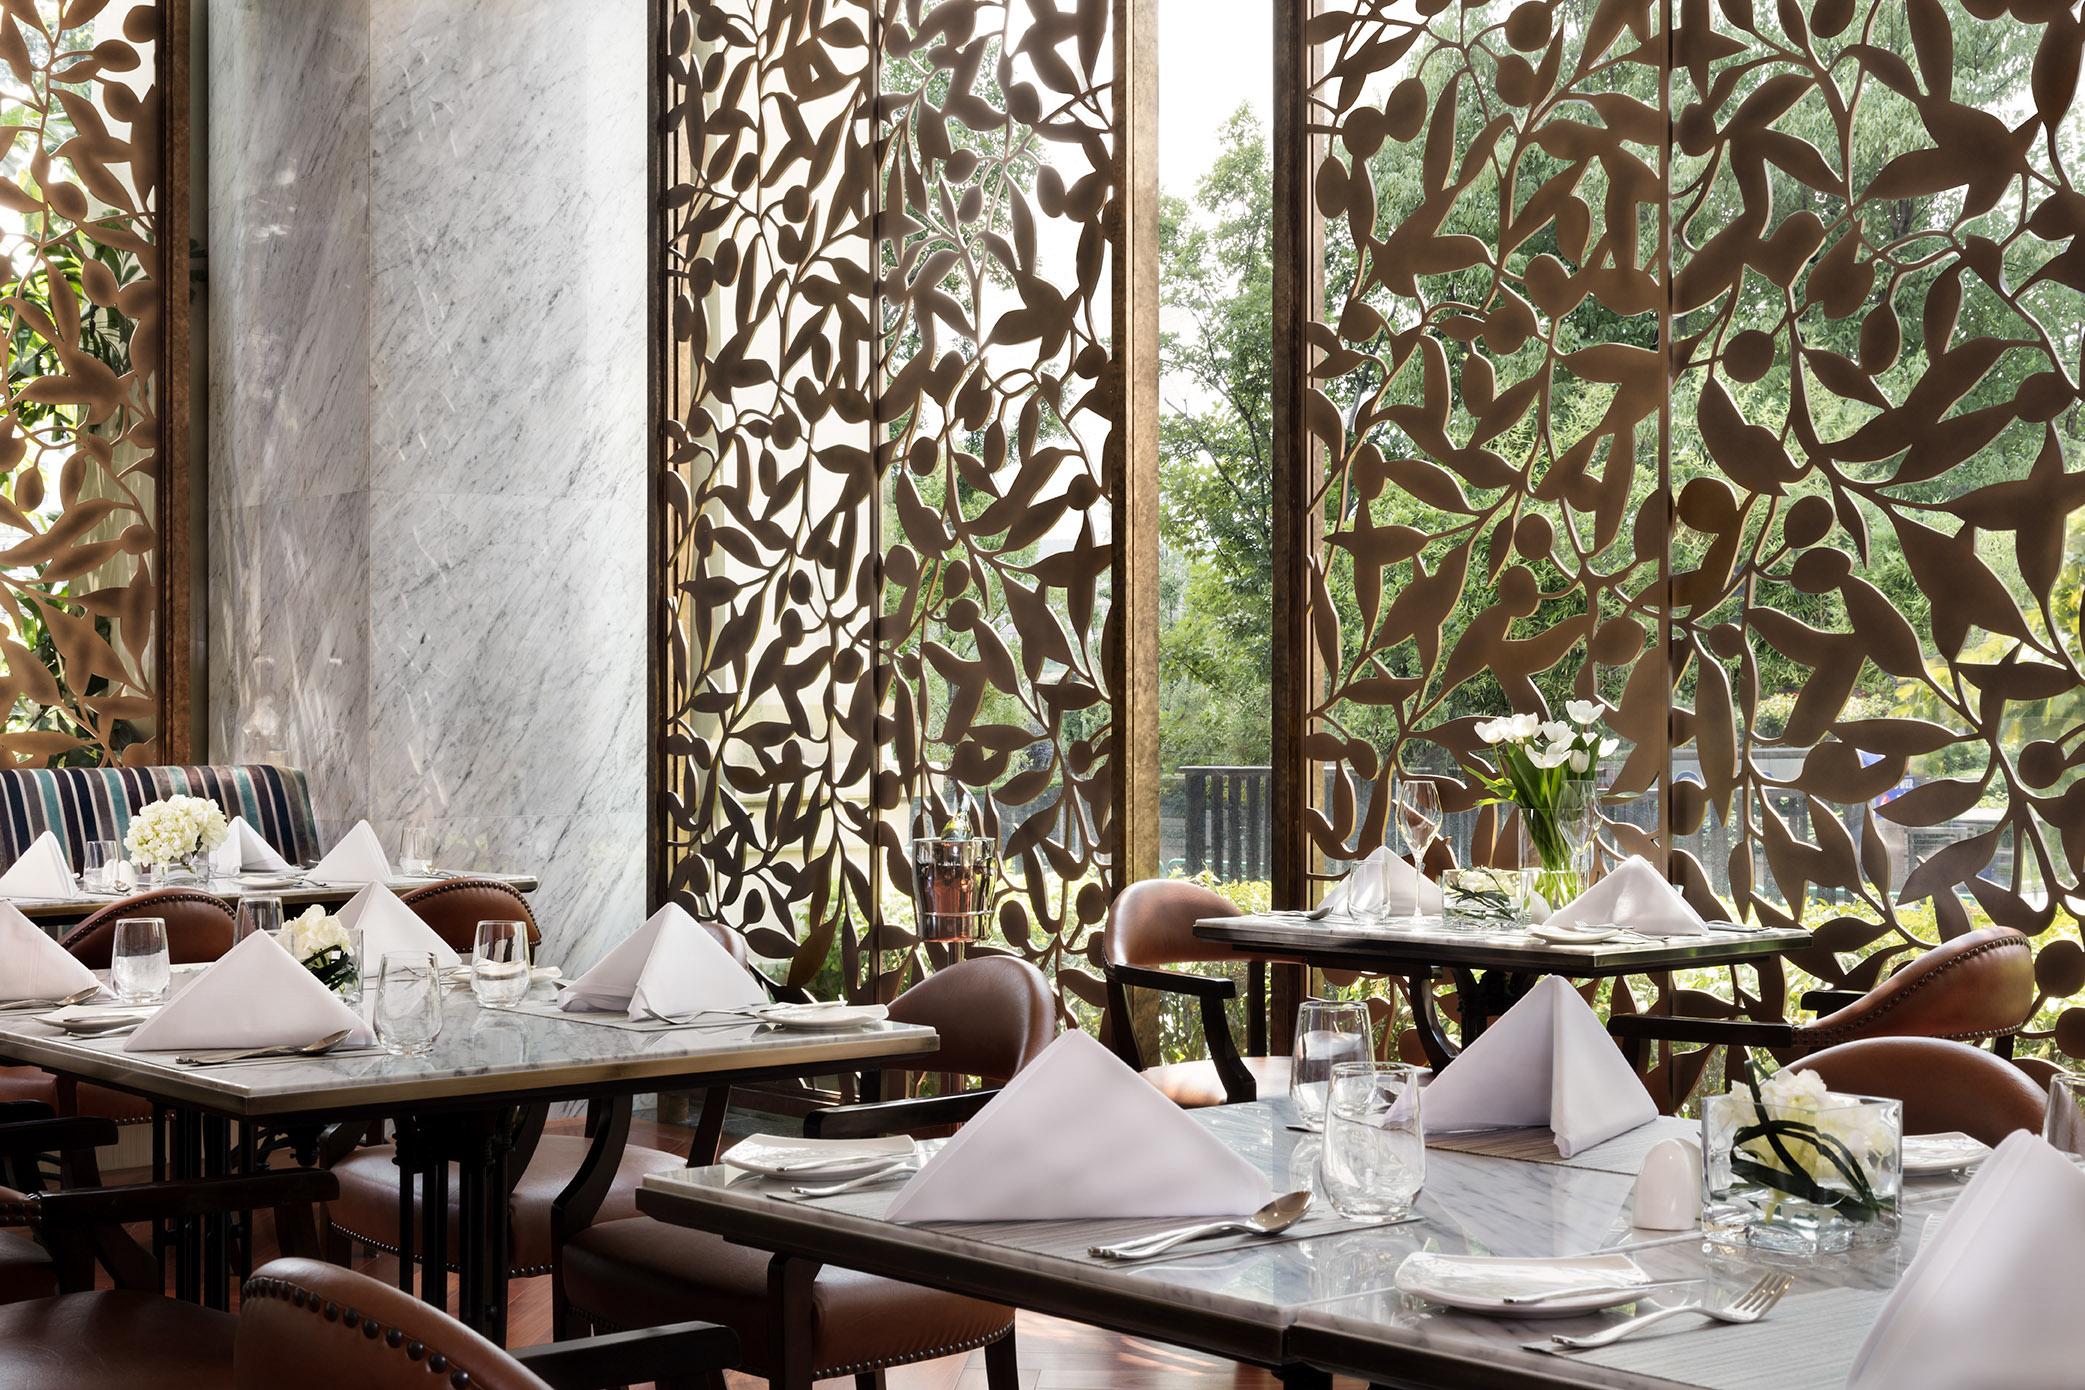 14_Siam_Brassier_Dining_Corner_H7A6130_Final_SM